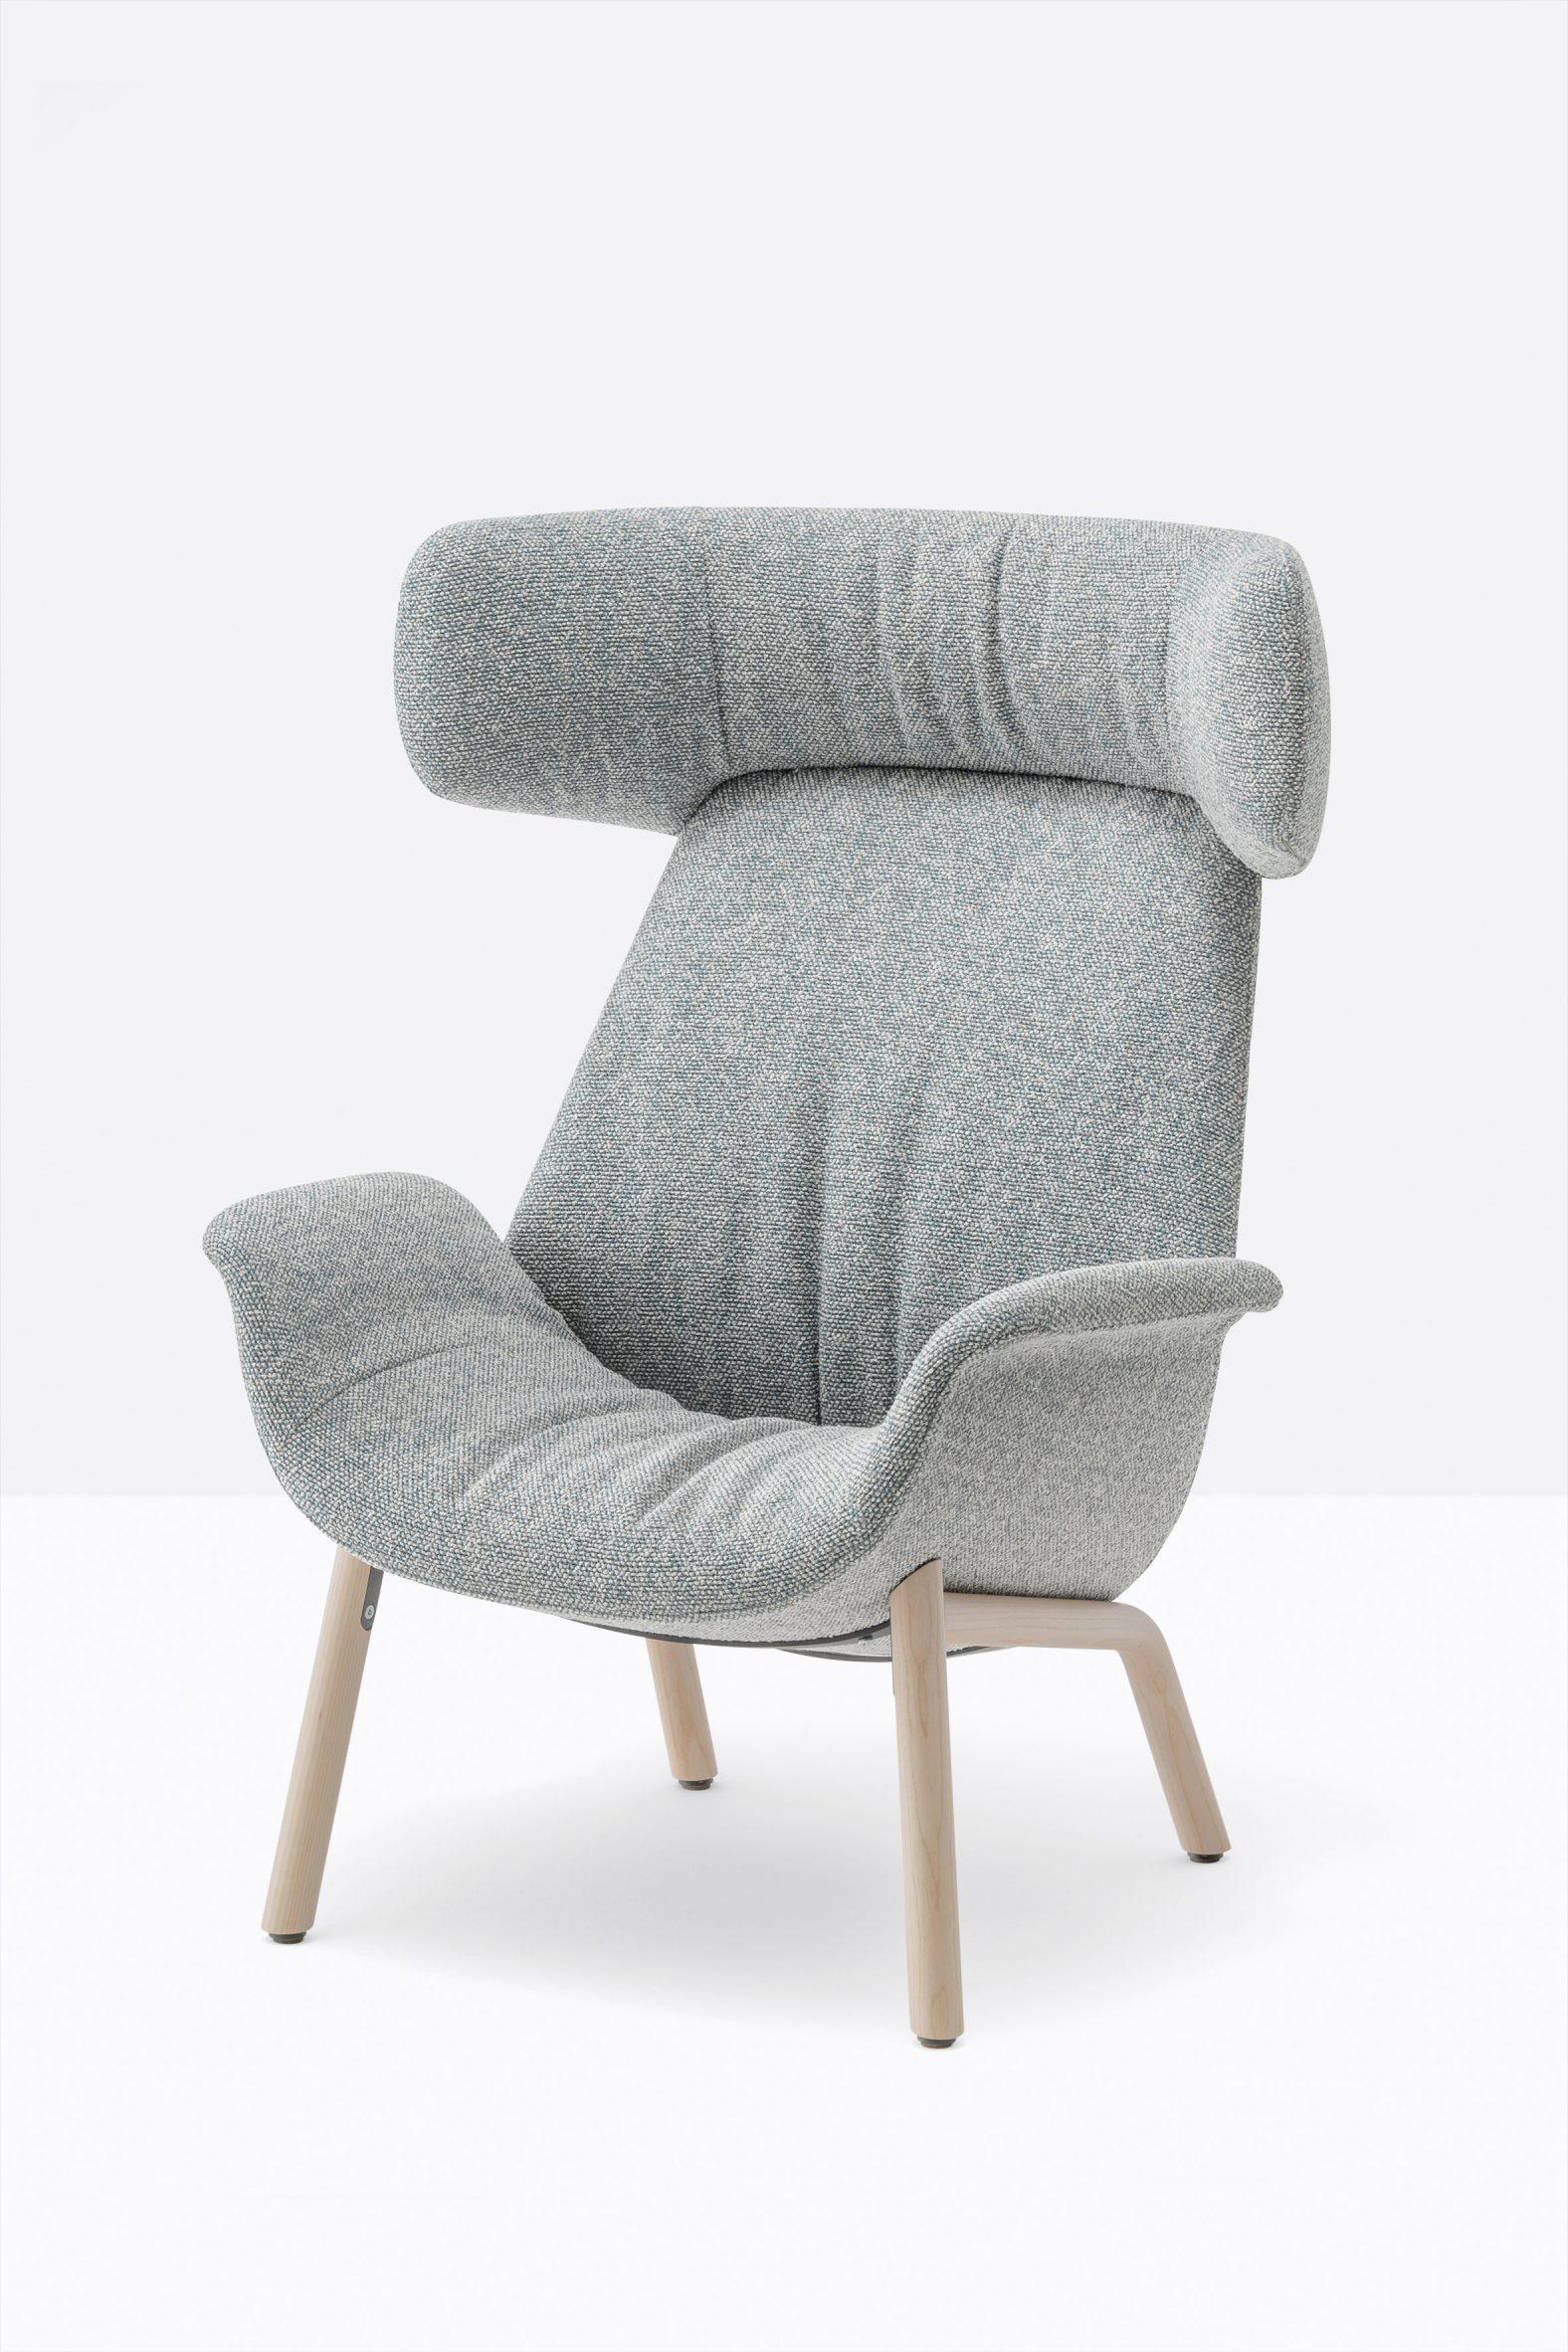 A photograph of a grey armchair